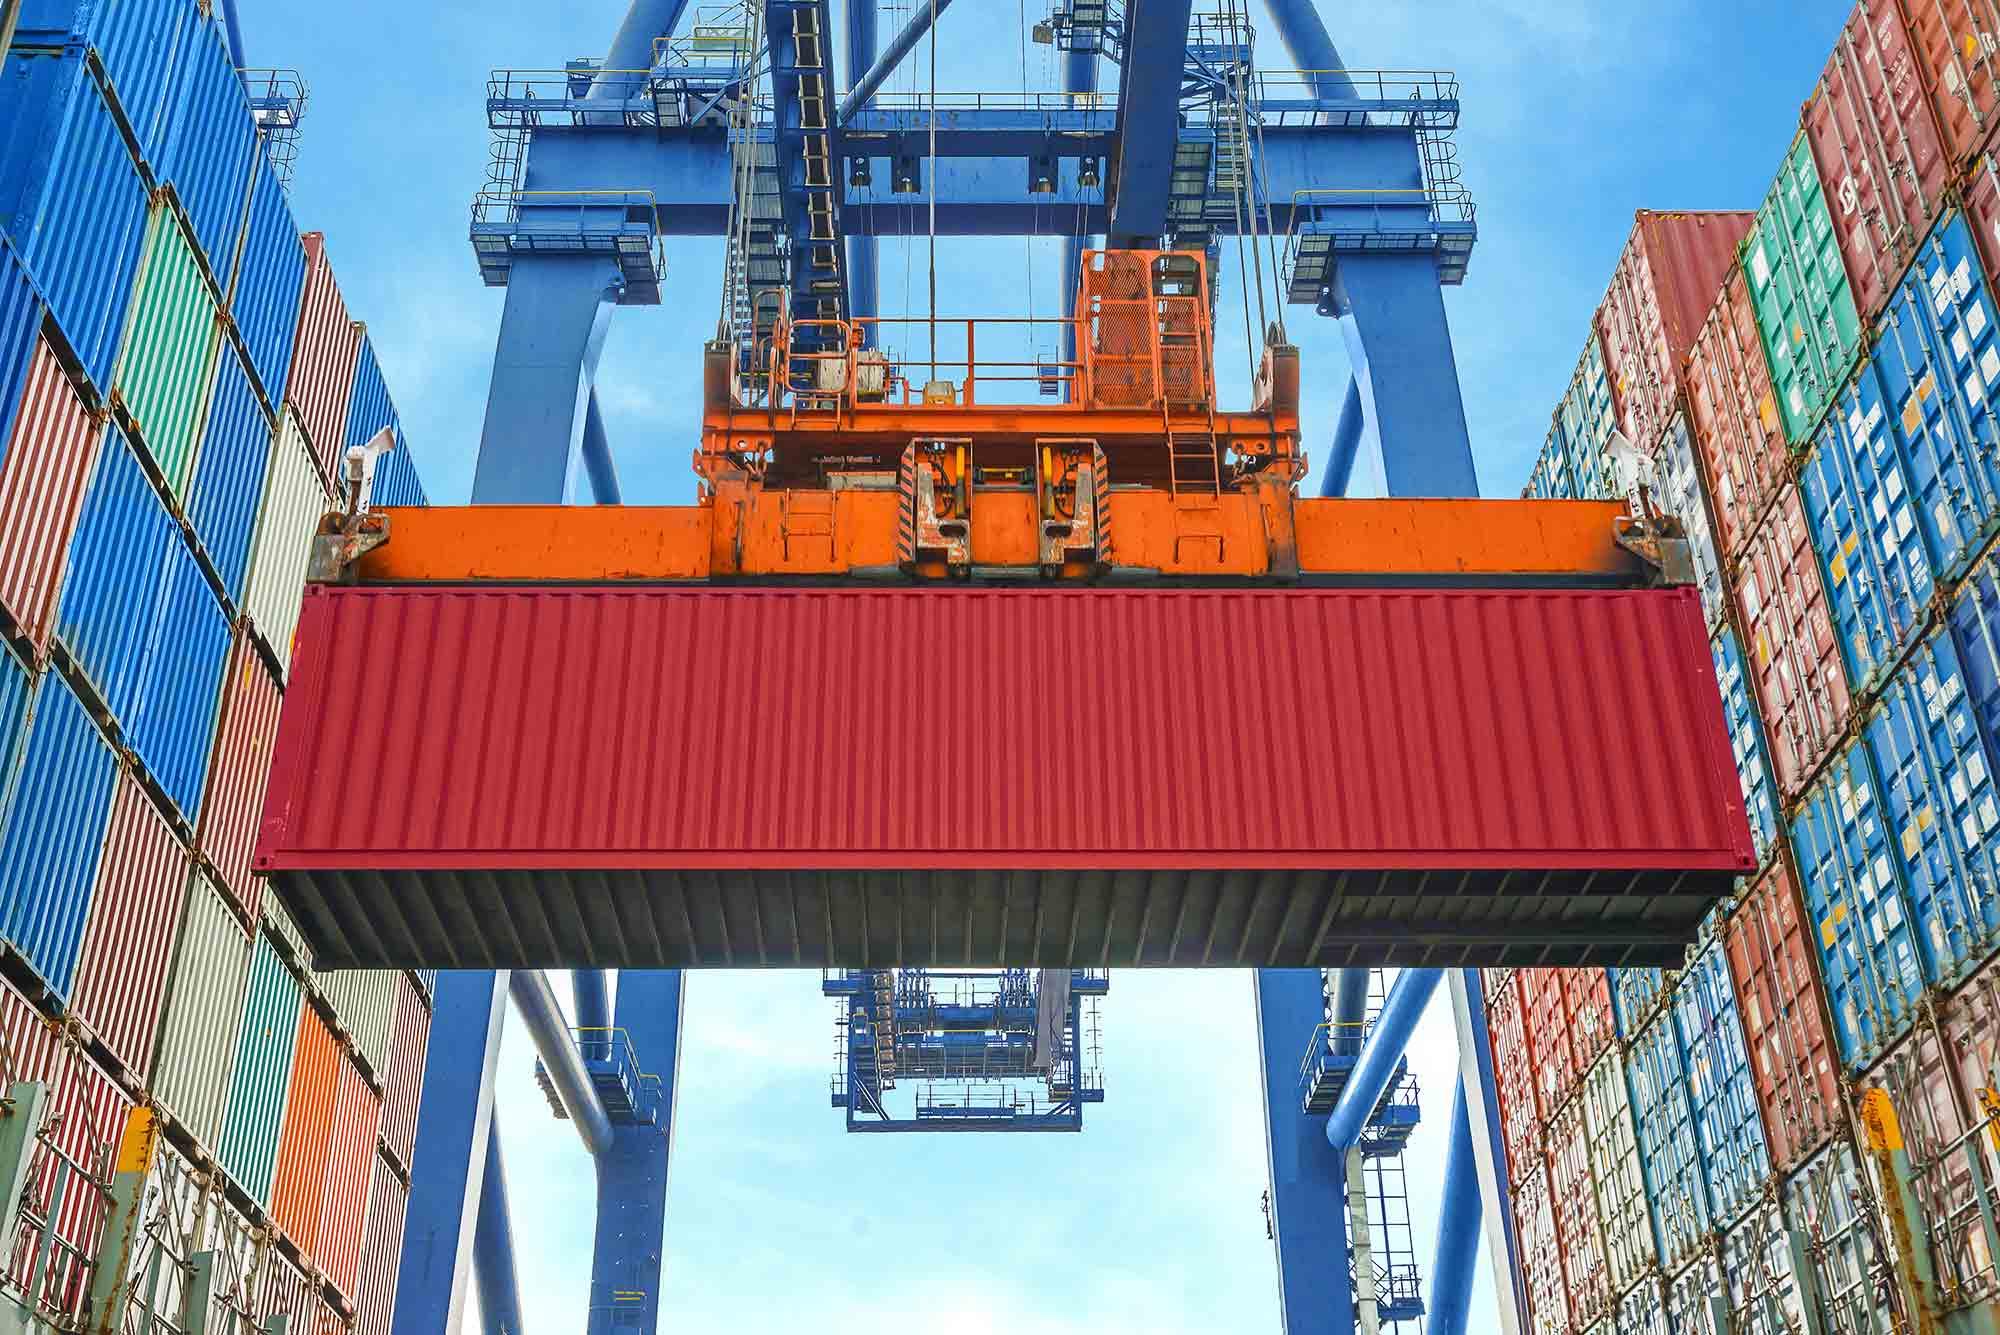 MercuryPartners - Container on a crane